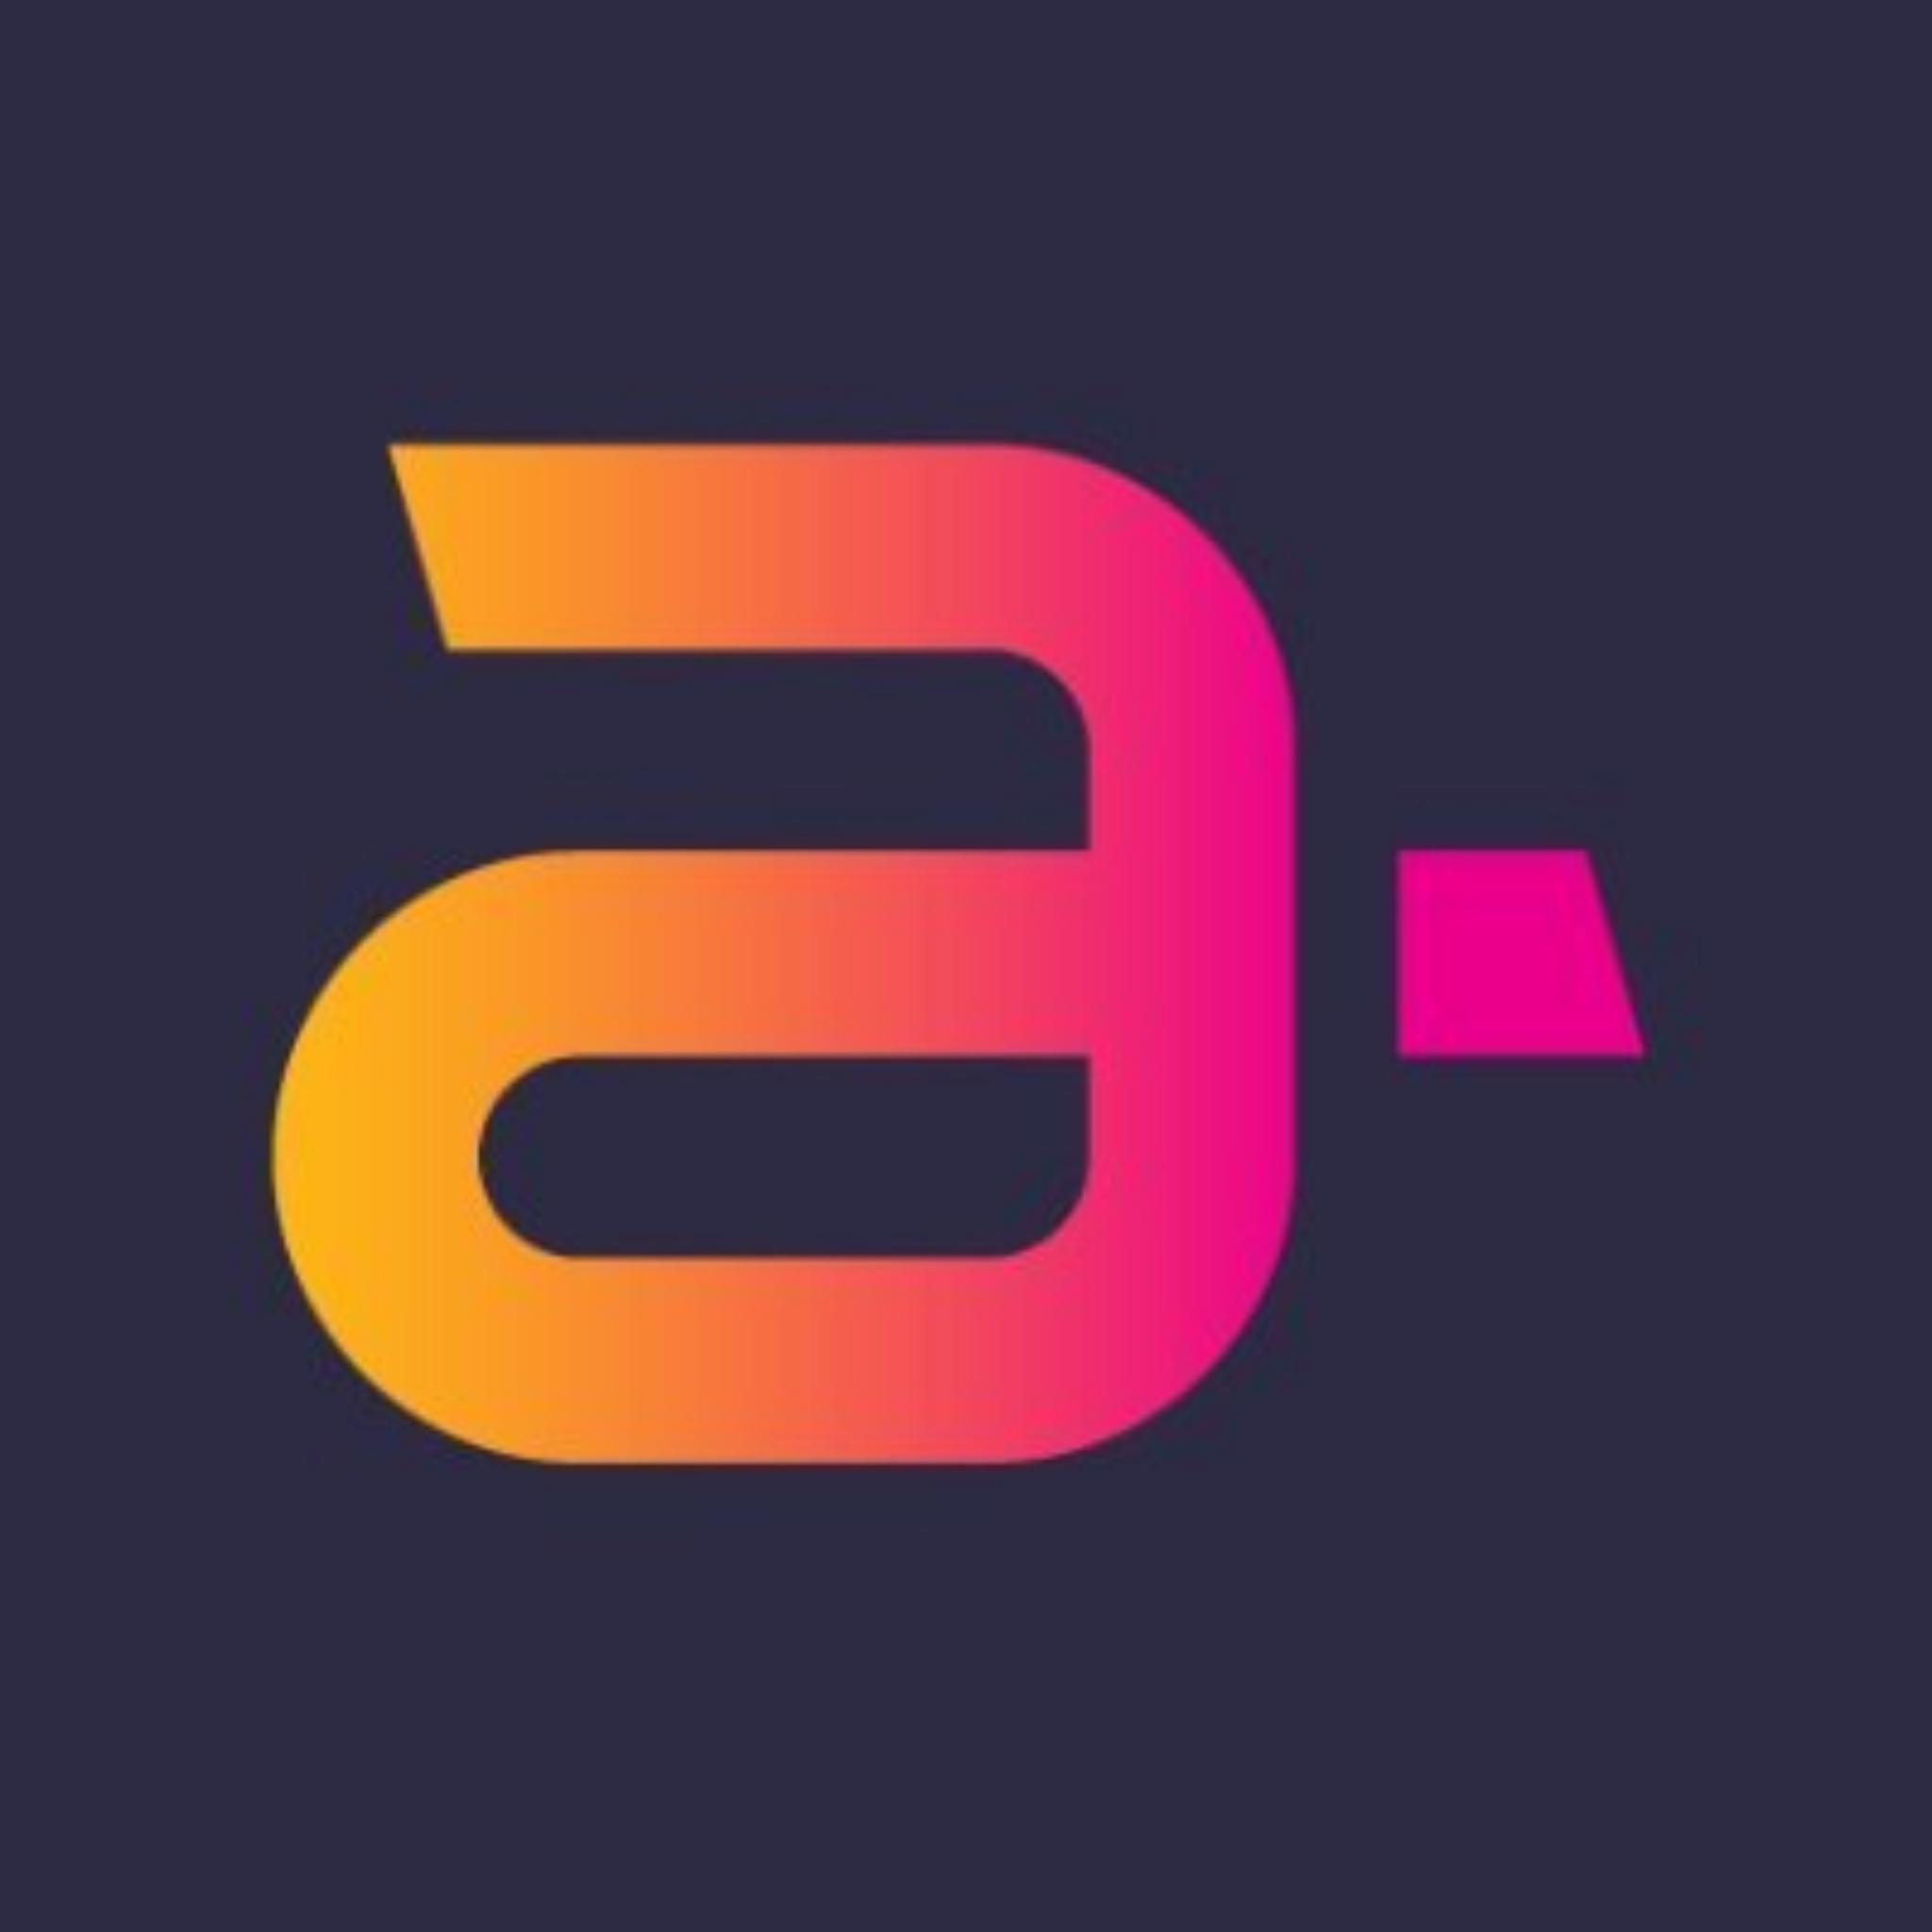 https://www.indiantelevision.com/sites/default/files/styles/smartcrop_800x800/public/images/tv-images/2021/08/18/photogrid_plus_1629282630790.jpg?itok=Aqd0aY3p